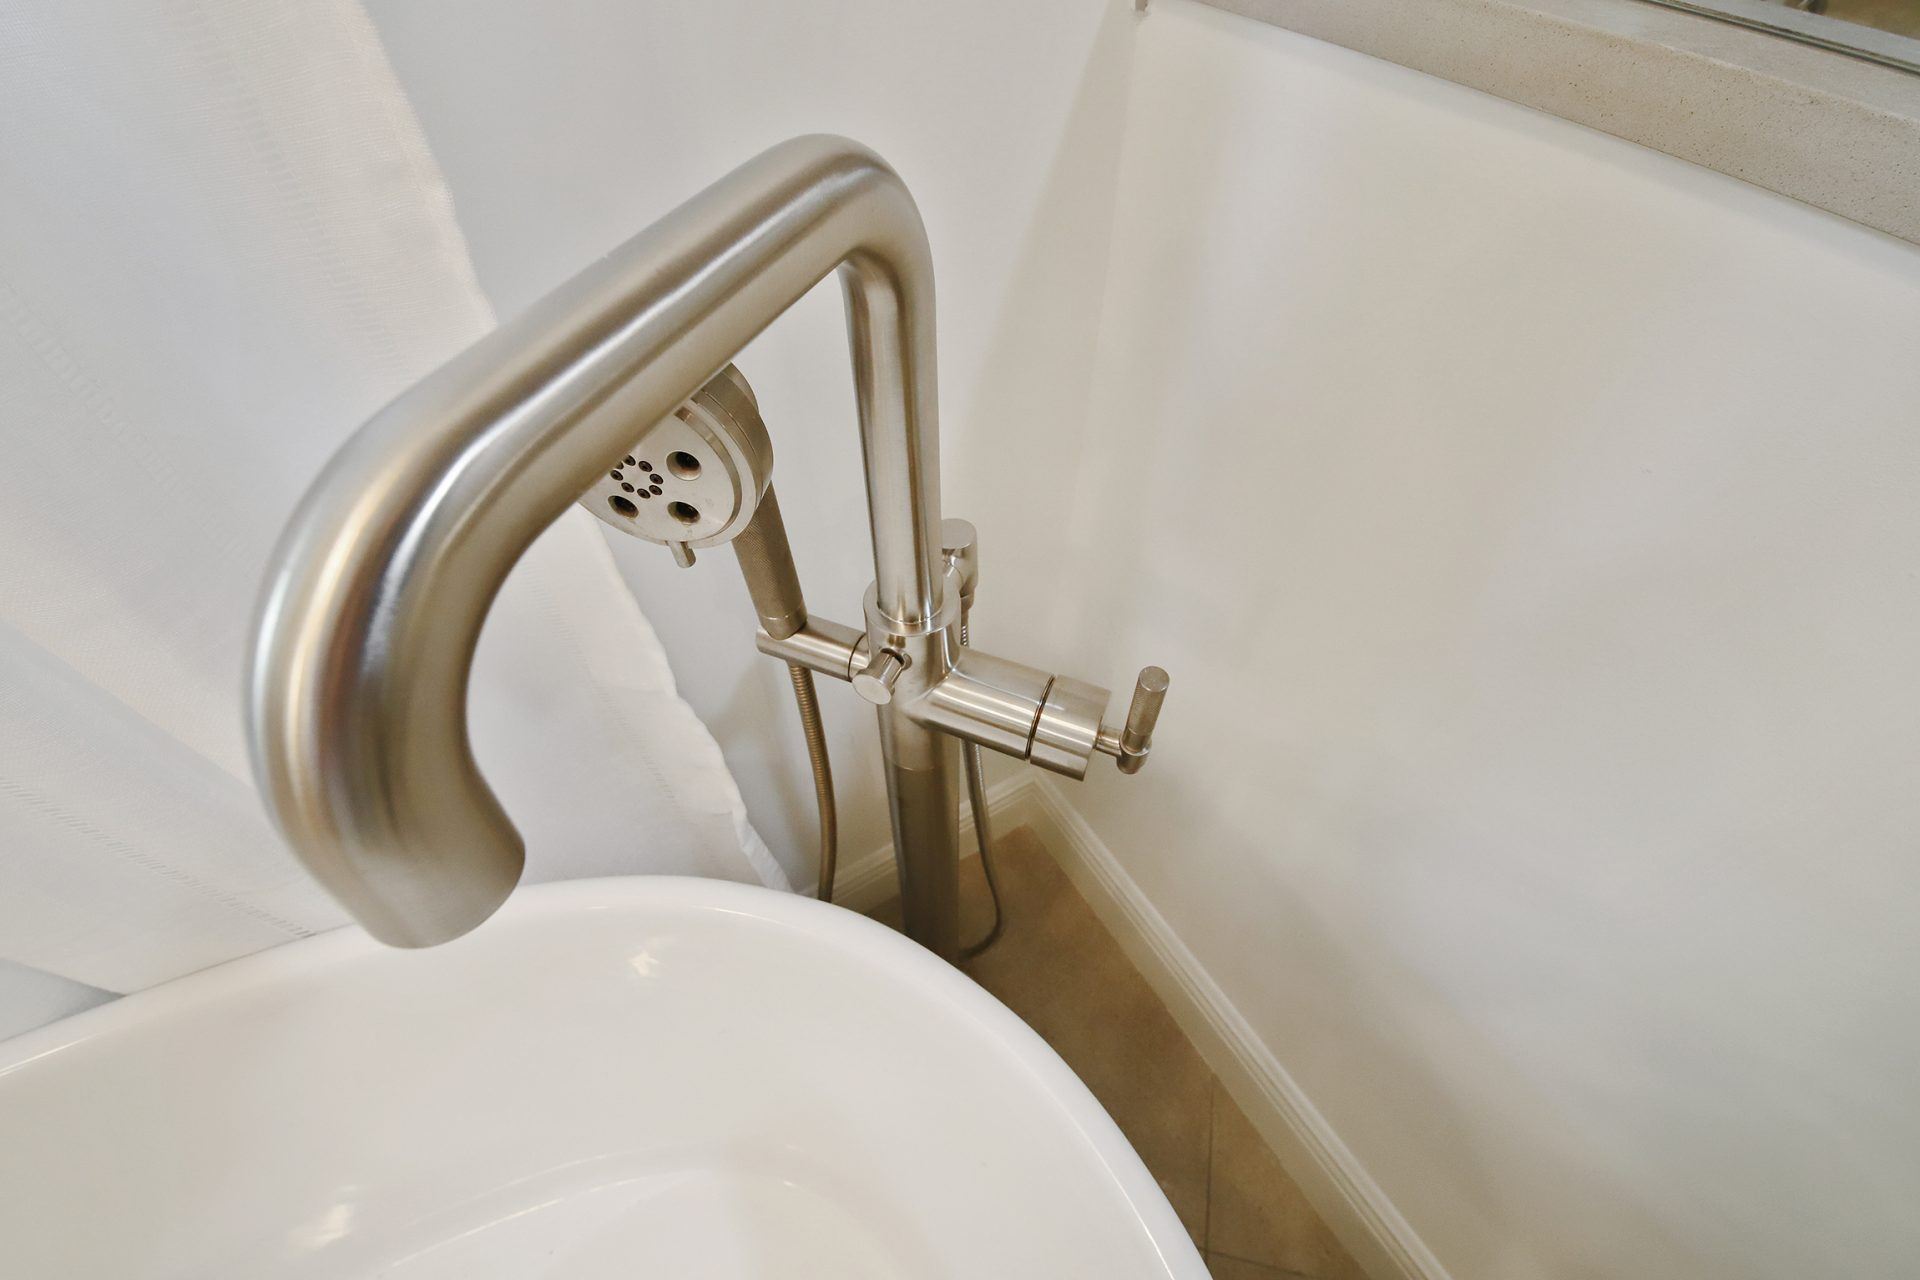 Master Bathroom Sanctuary | Tub Faucet